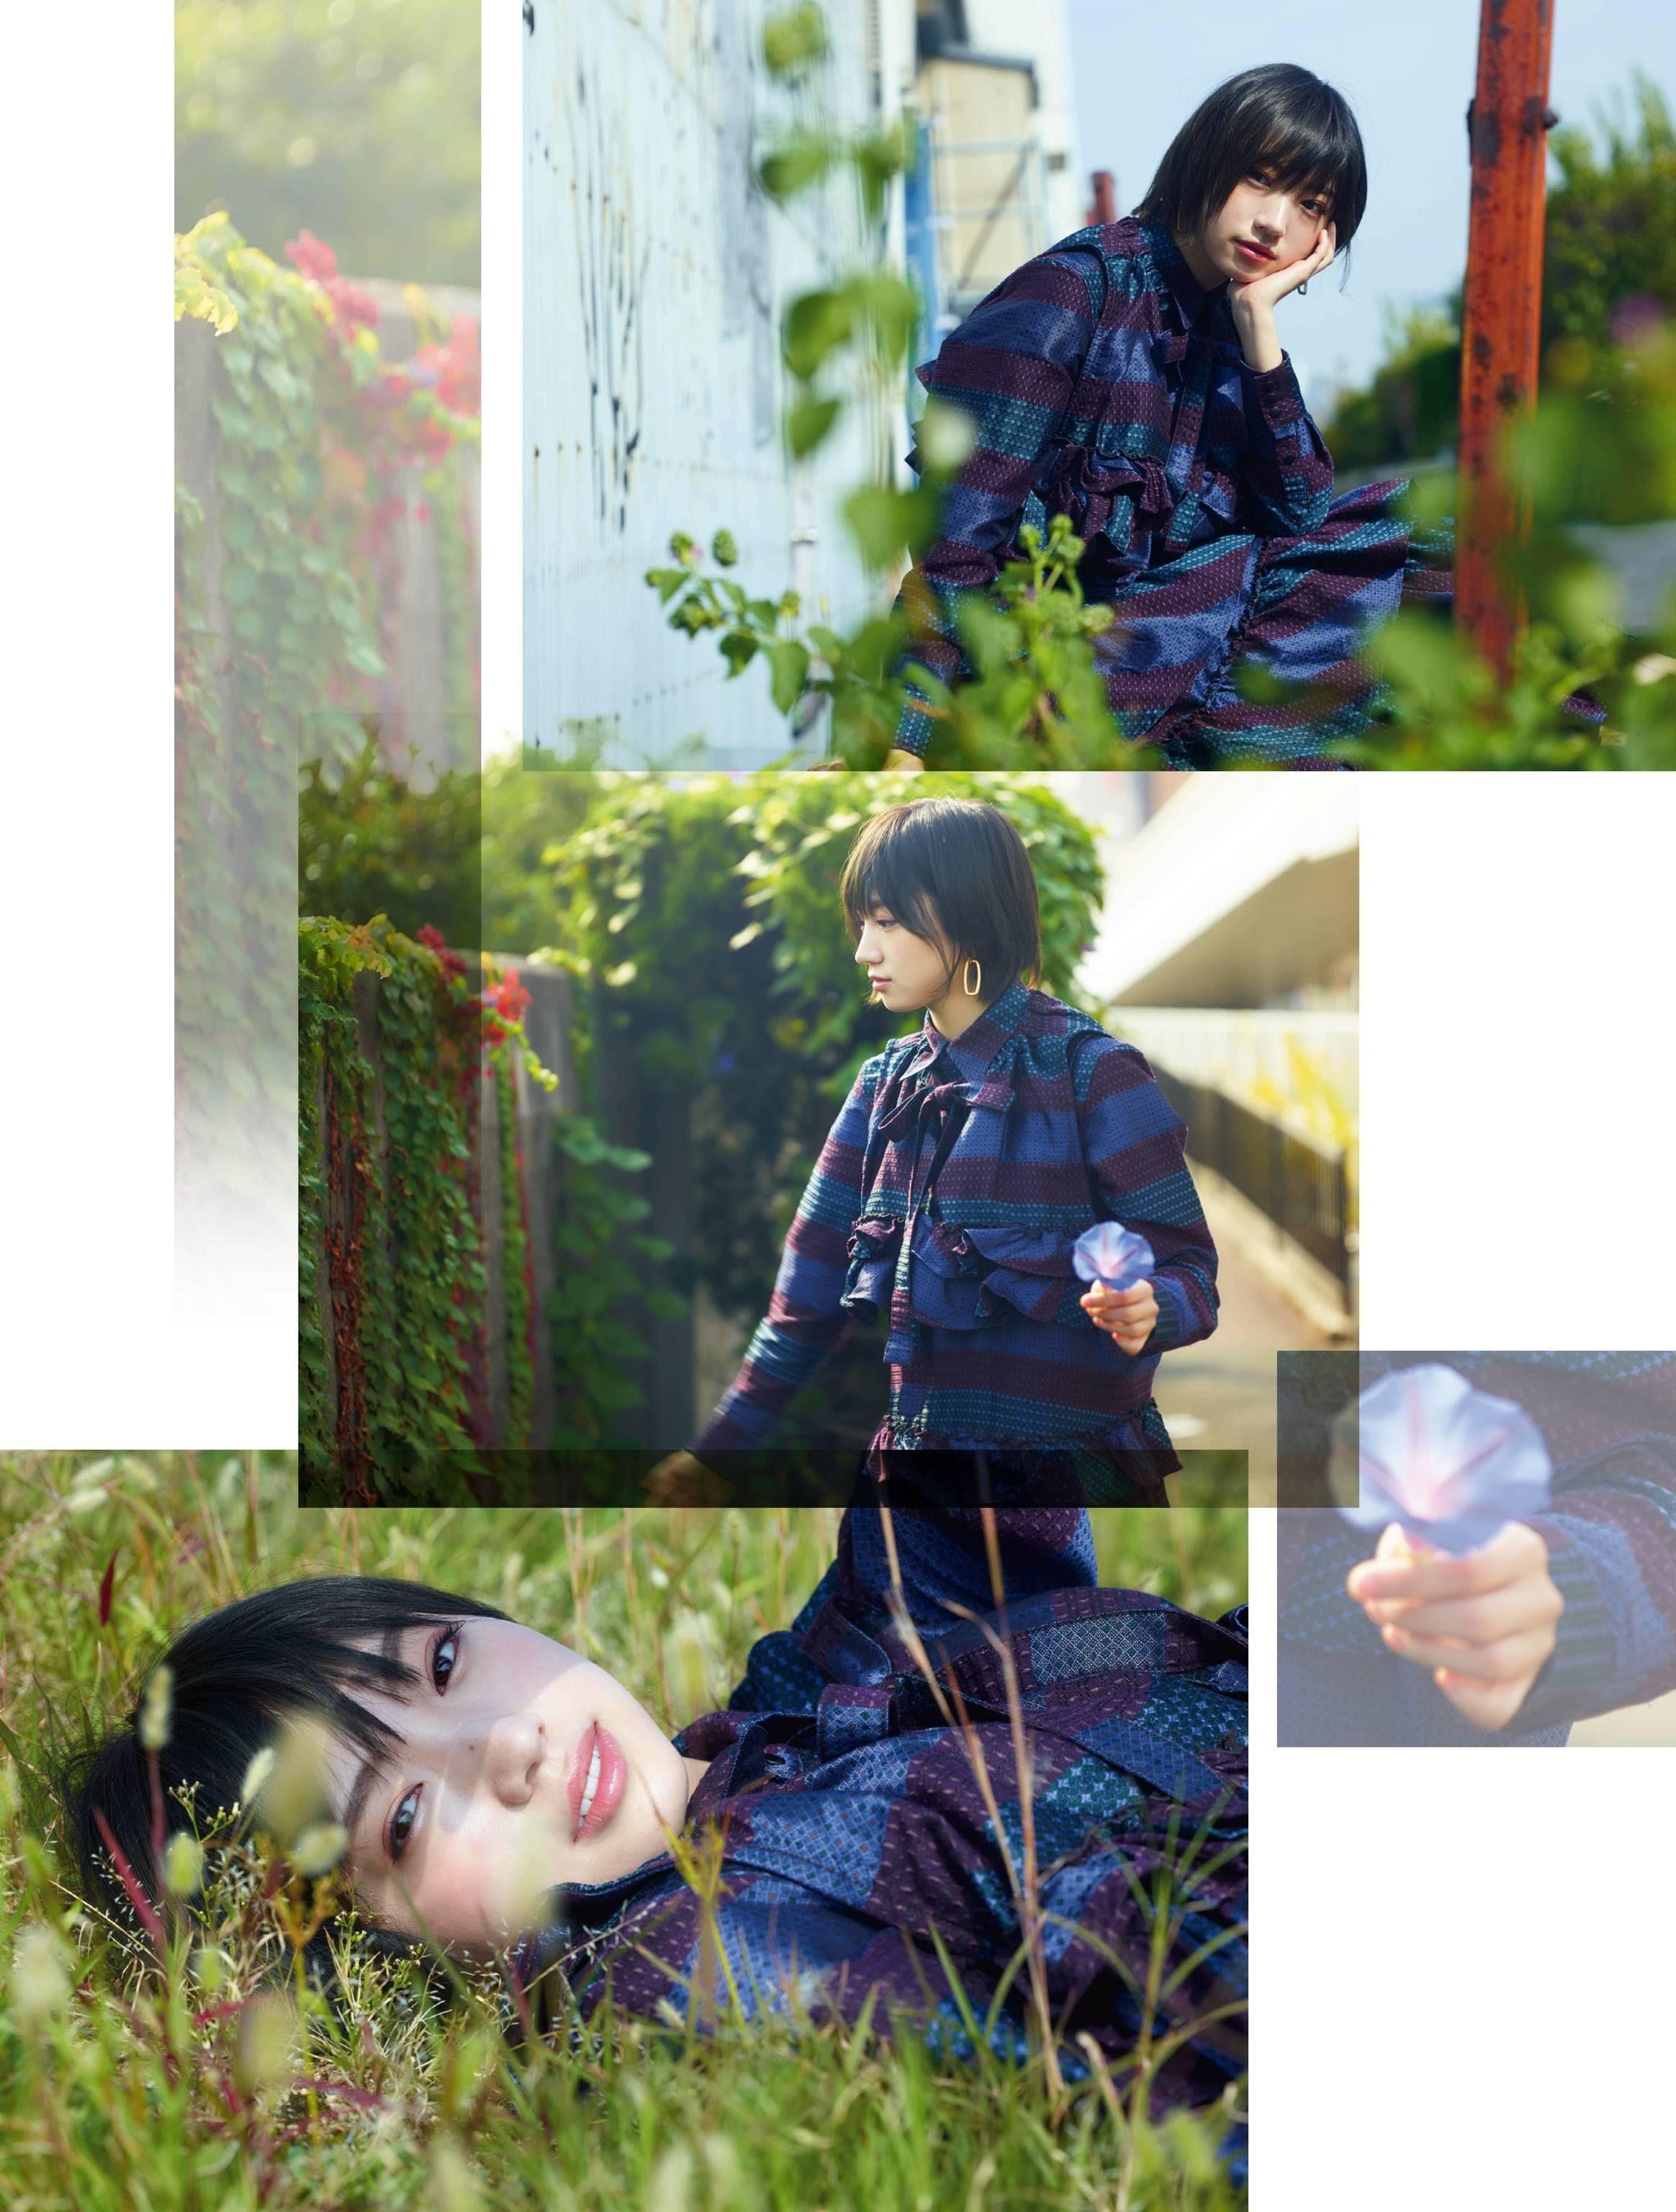 05-Yuuri Ota (4)